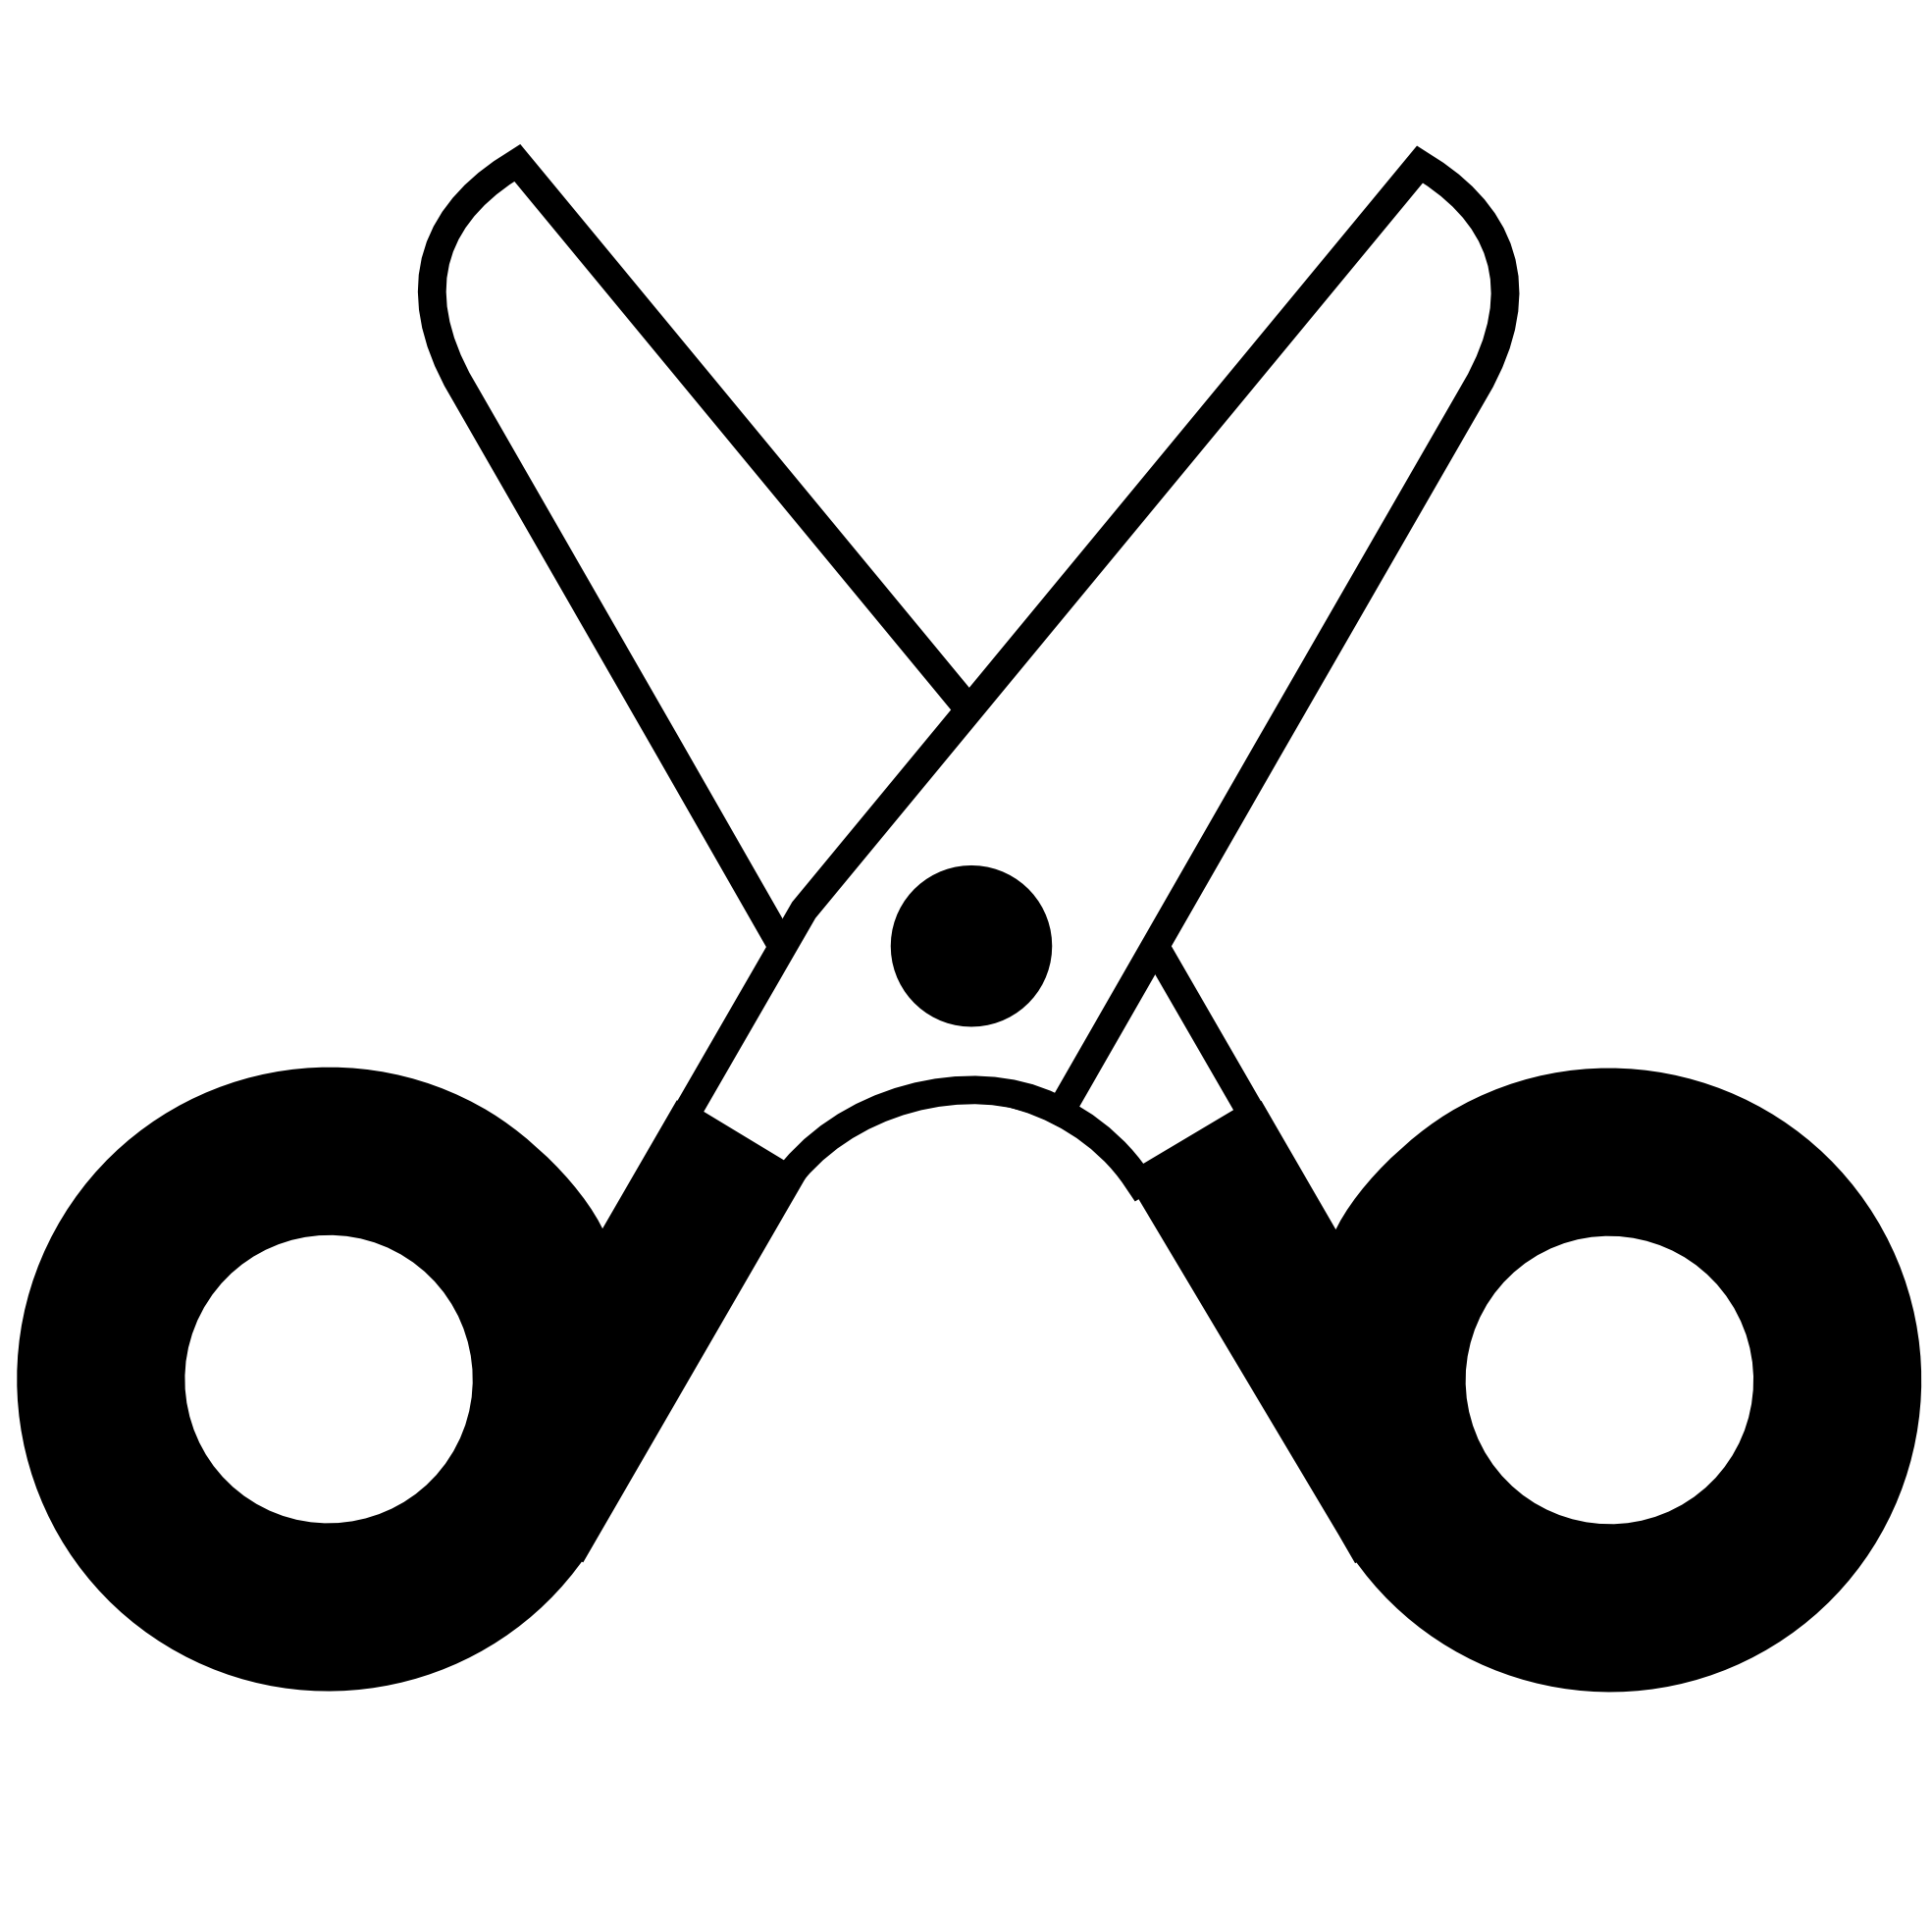 Zen clipart black and white And scissors%20clipart%20black%20and%20white Images Black Clipart